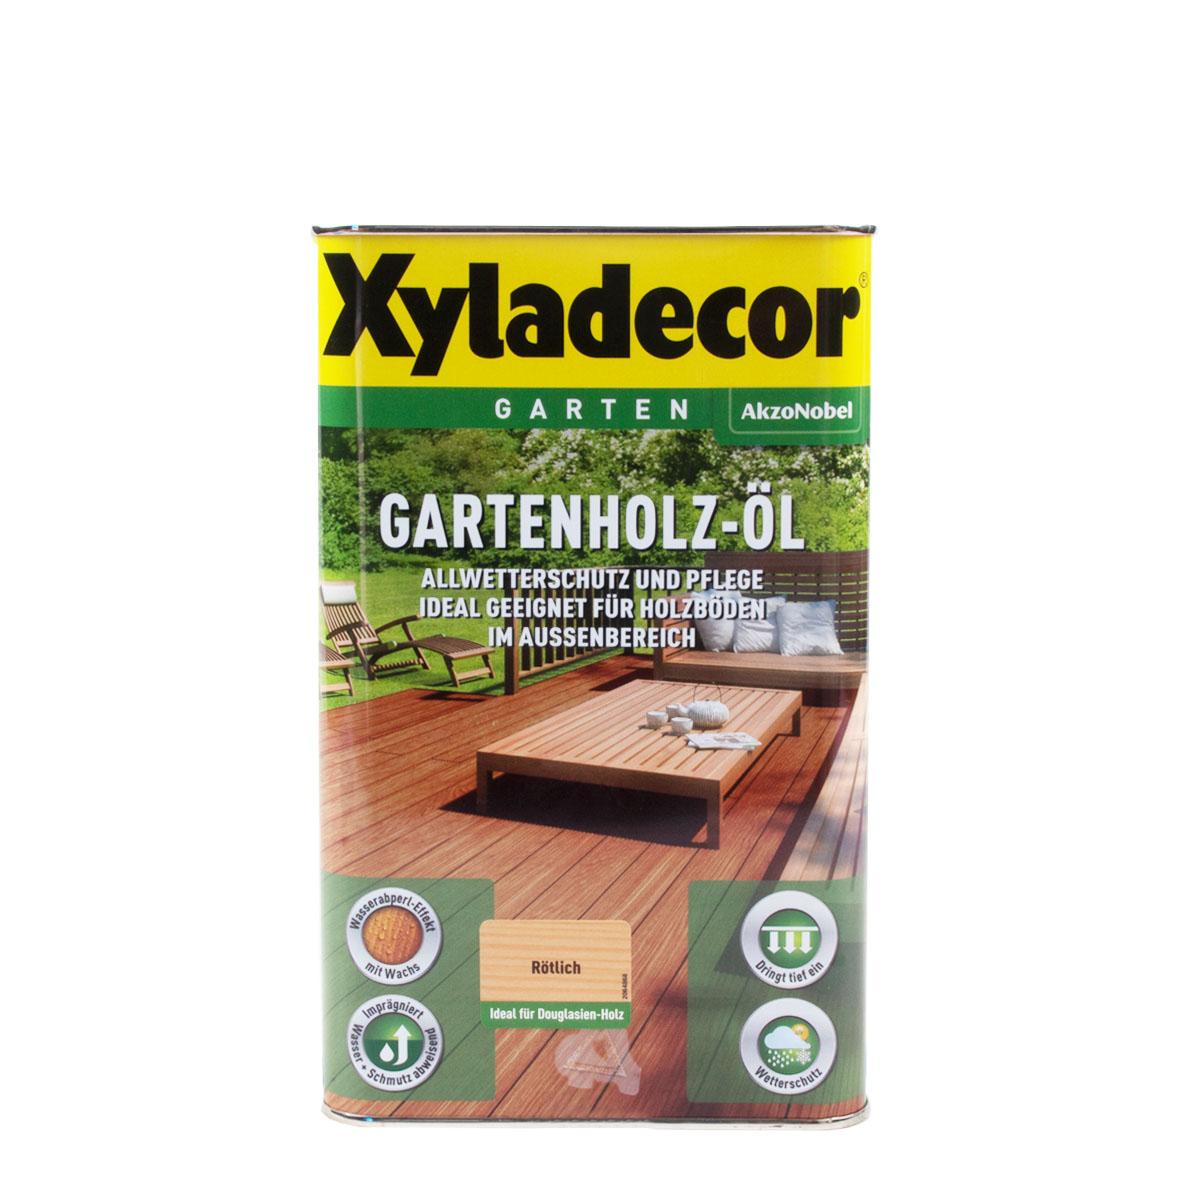 Xyladecor Gartenholz-Öl Rötlich 2,5L